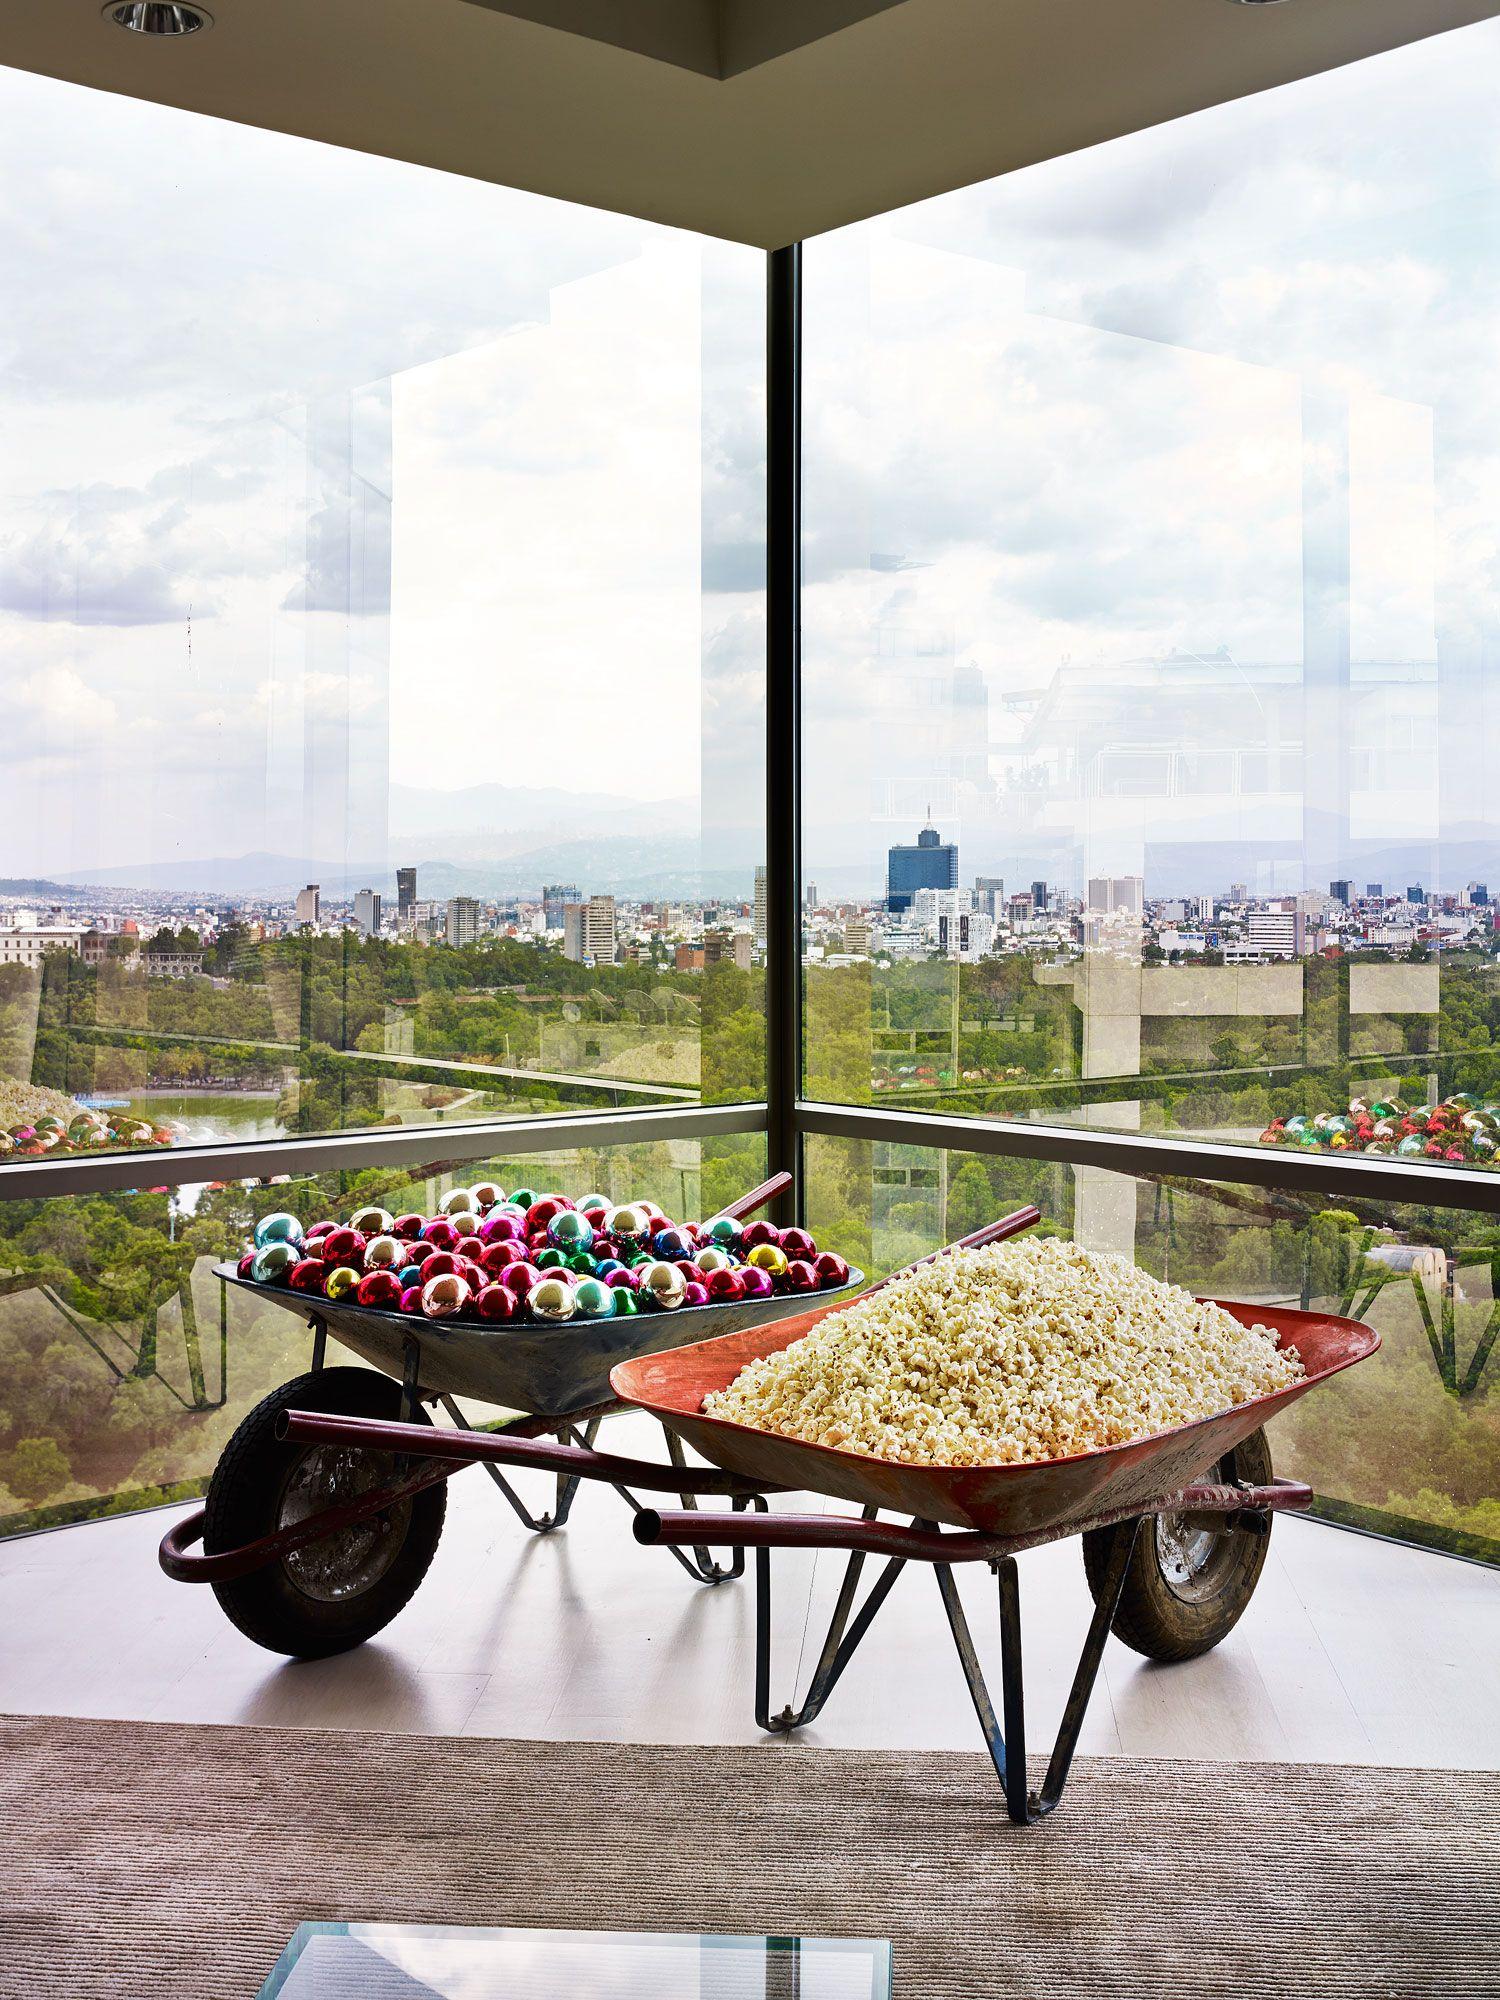 Art Nuevo - Gabriel Kuri's Carretilla IV, 1999, in the living room, with a view of Chapultepec Park.